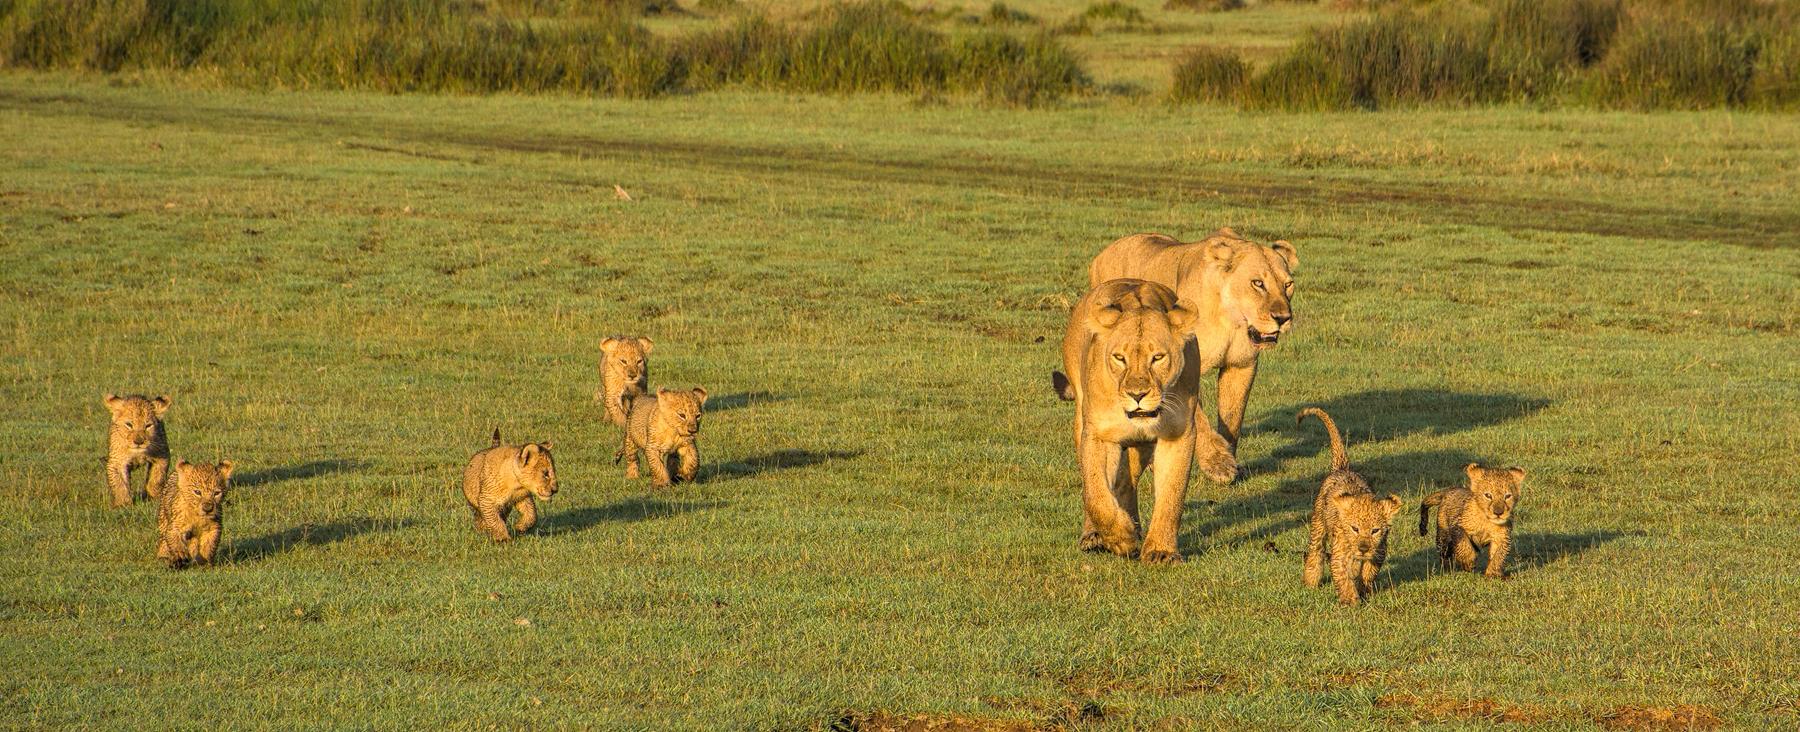 2 lionesses 7 cubs